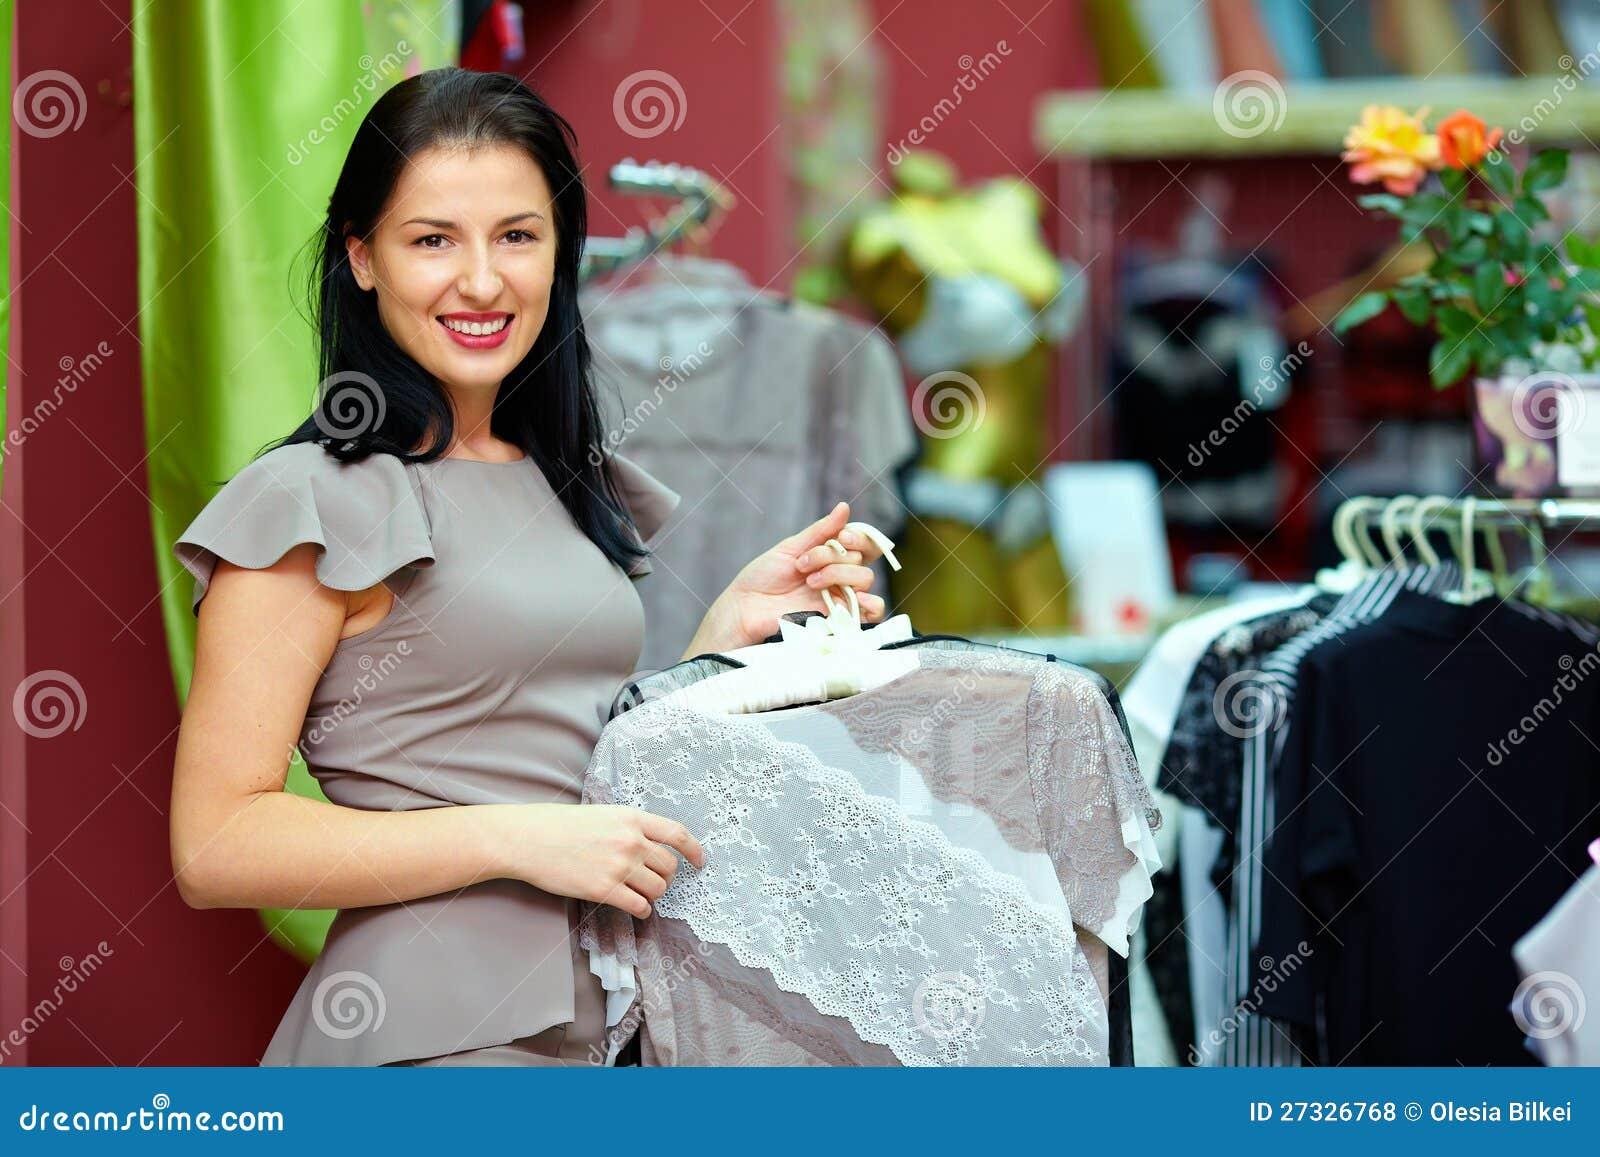 Pretty Woman Clothing Store